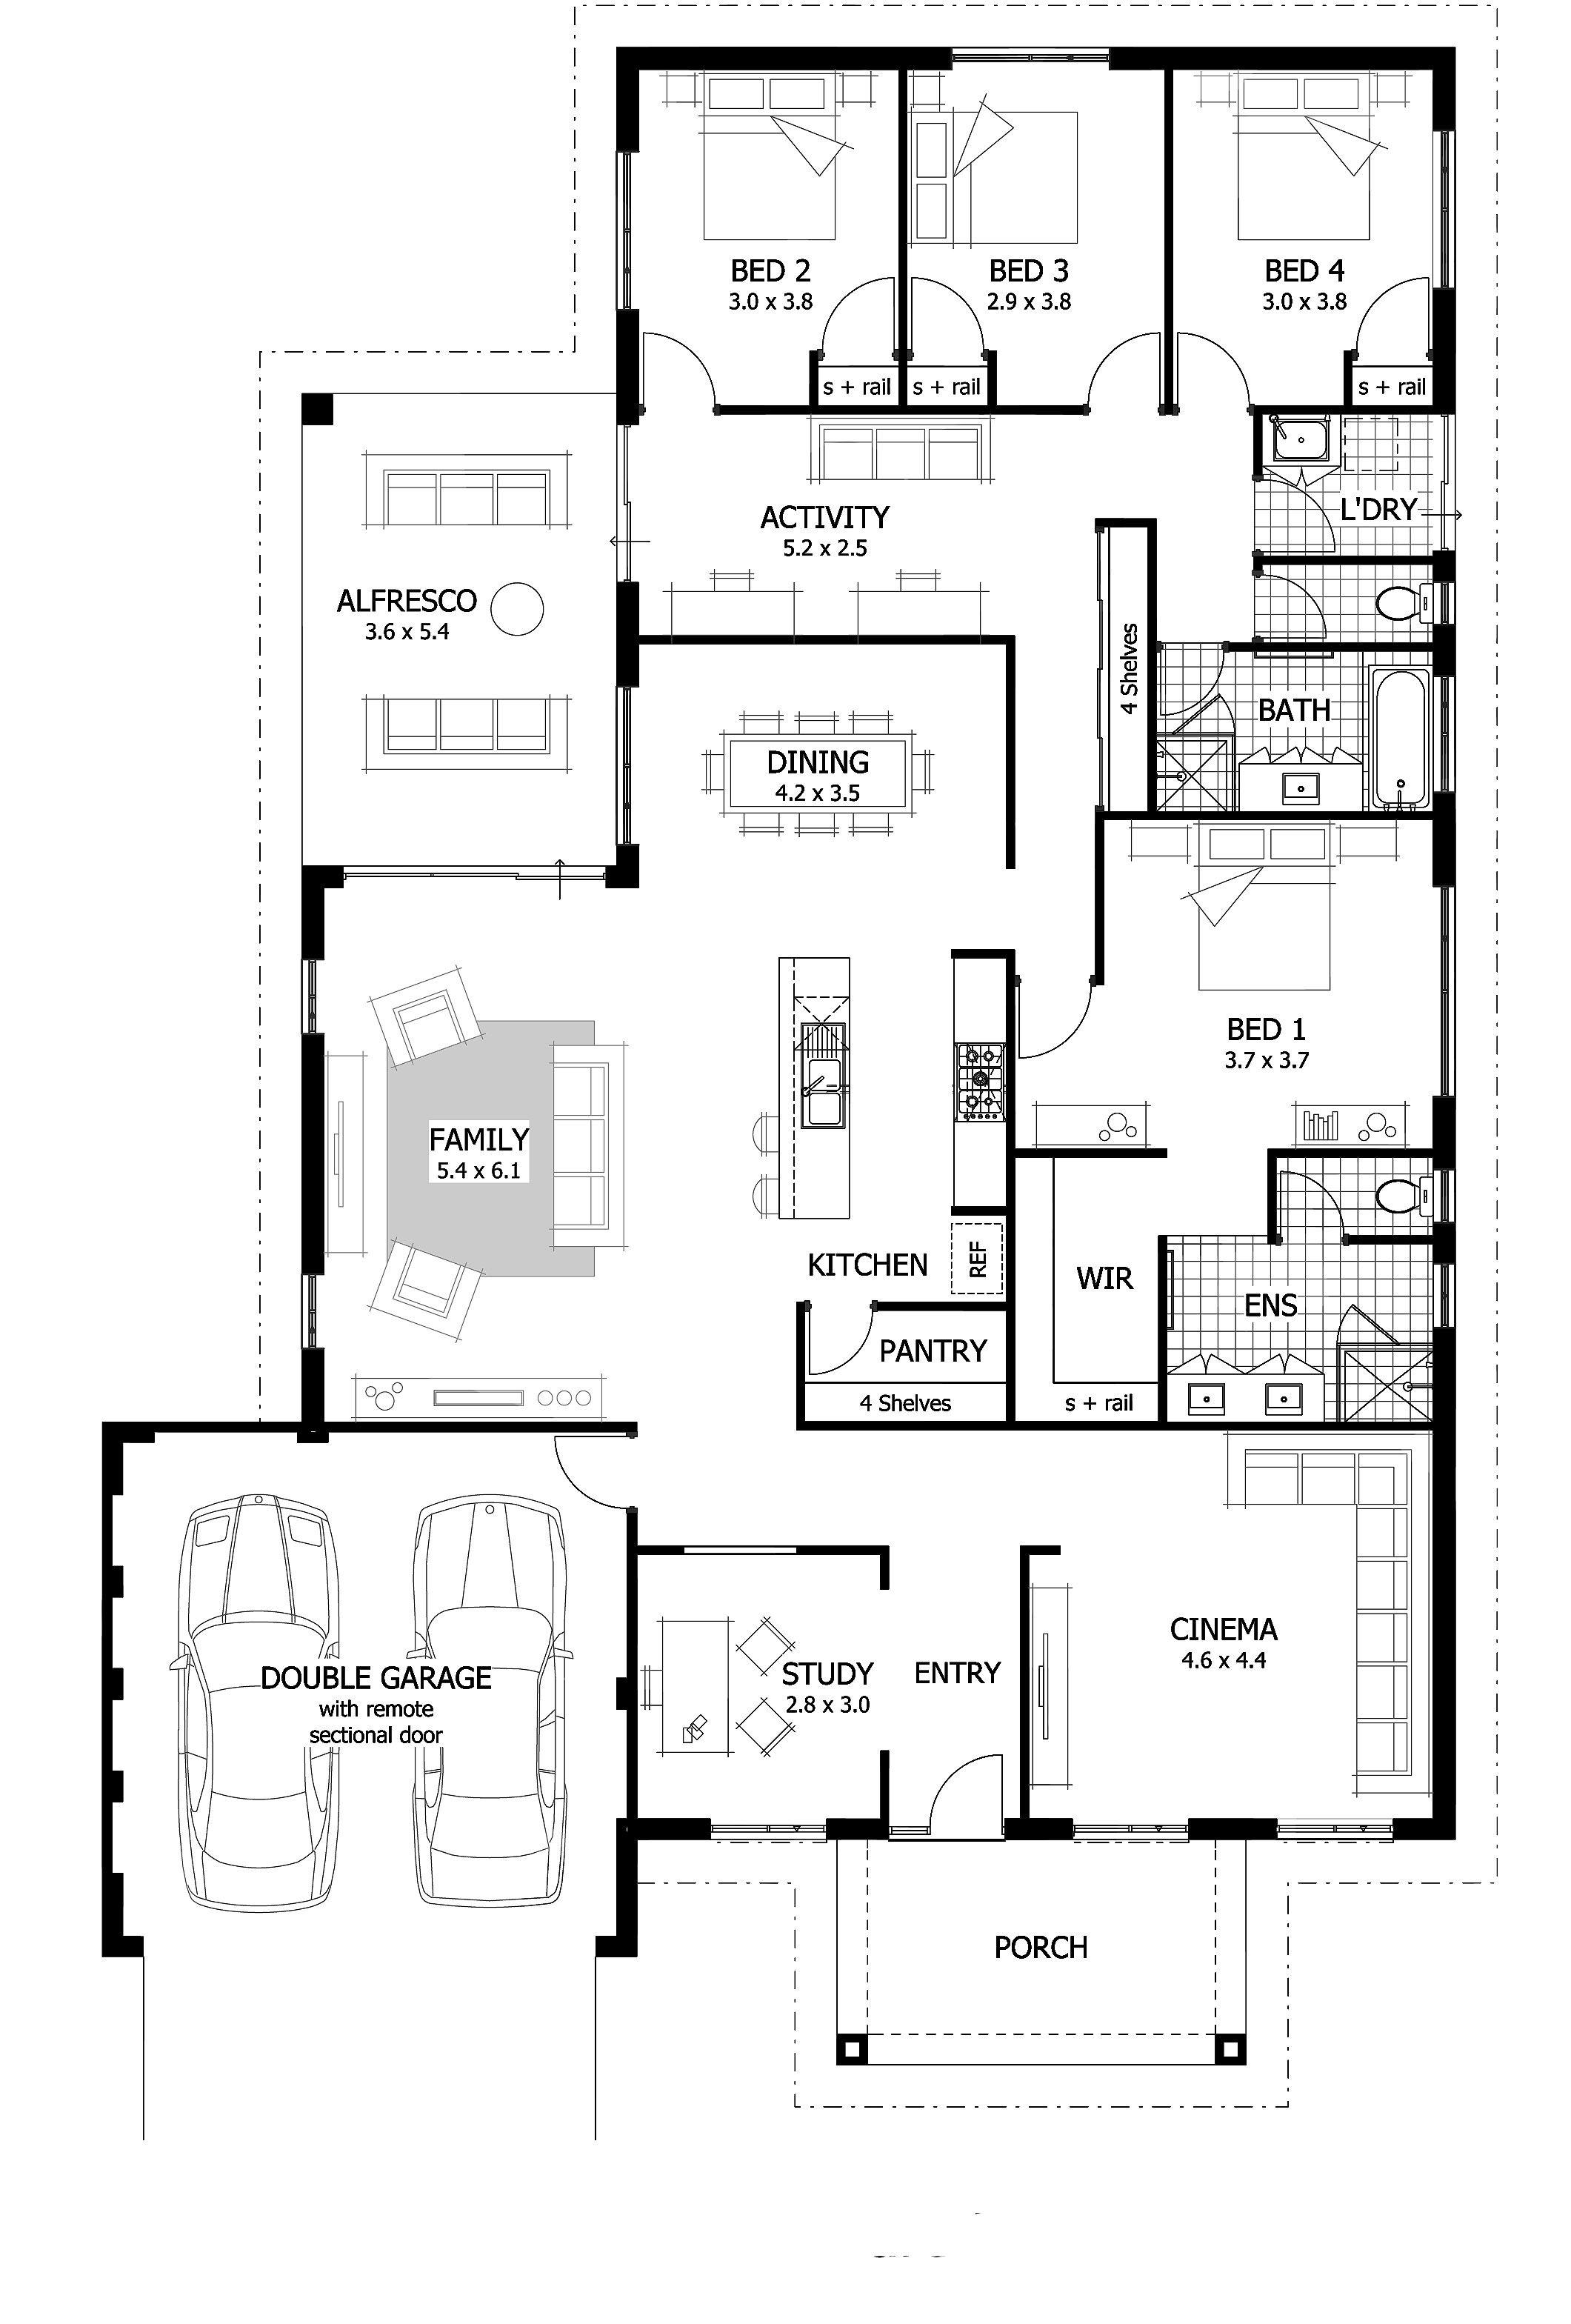 Best Kitchen Gallery: Bedroom House Plans Home Designs Celebration Homes Ranch Plan of Home Designs Floor Plans  on rachelxblog.com